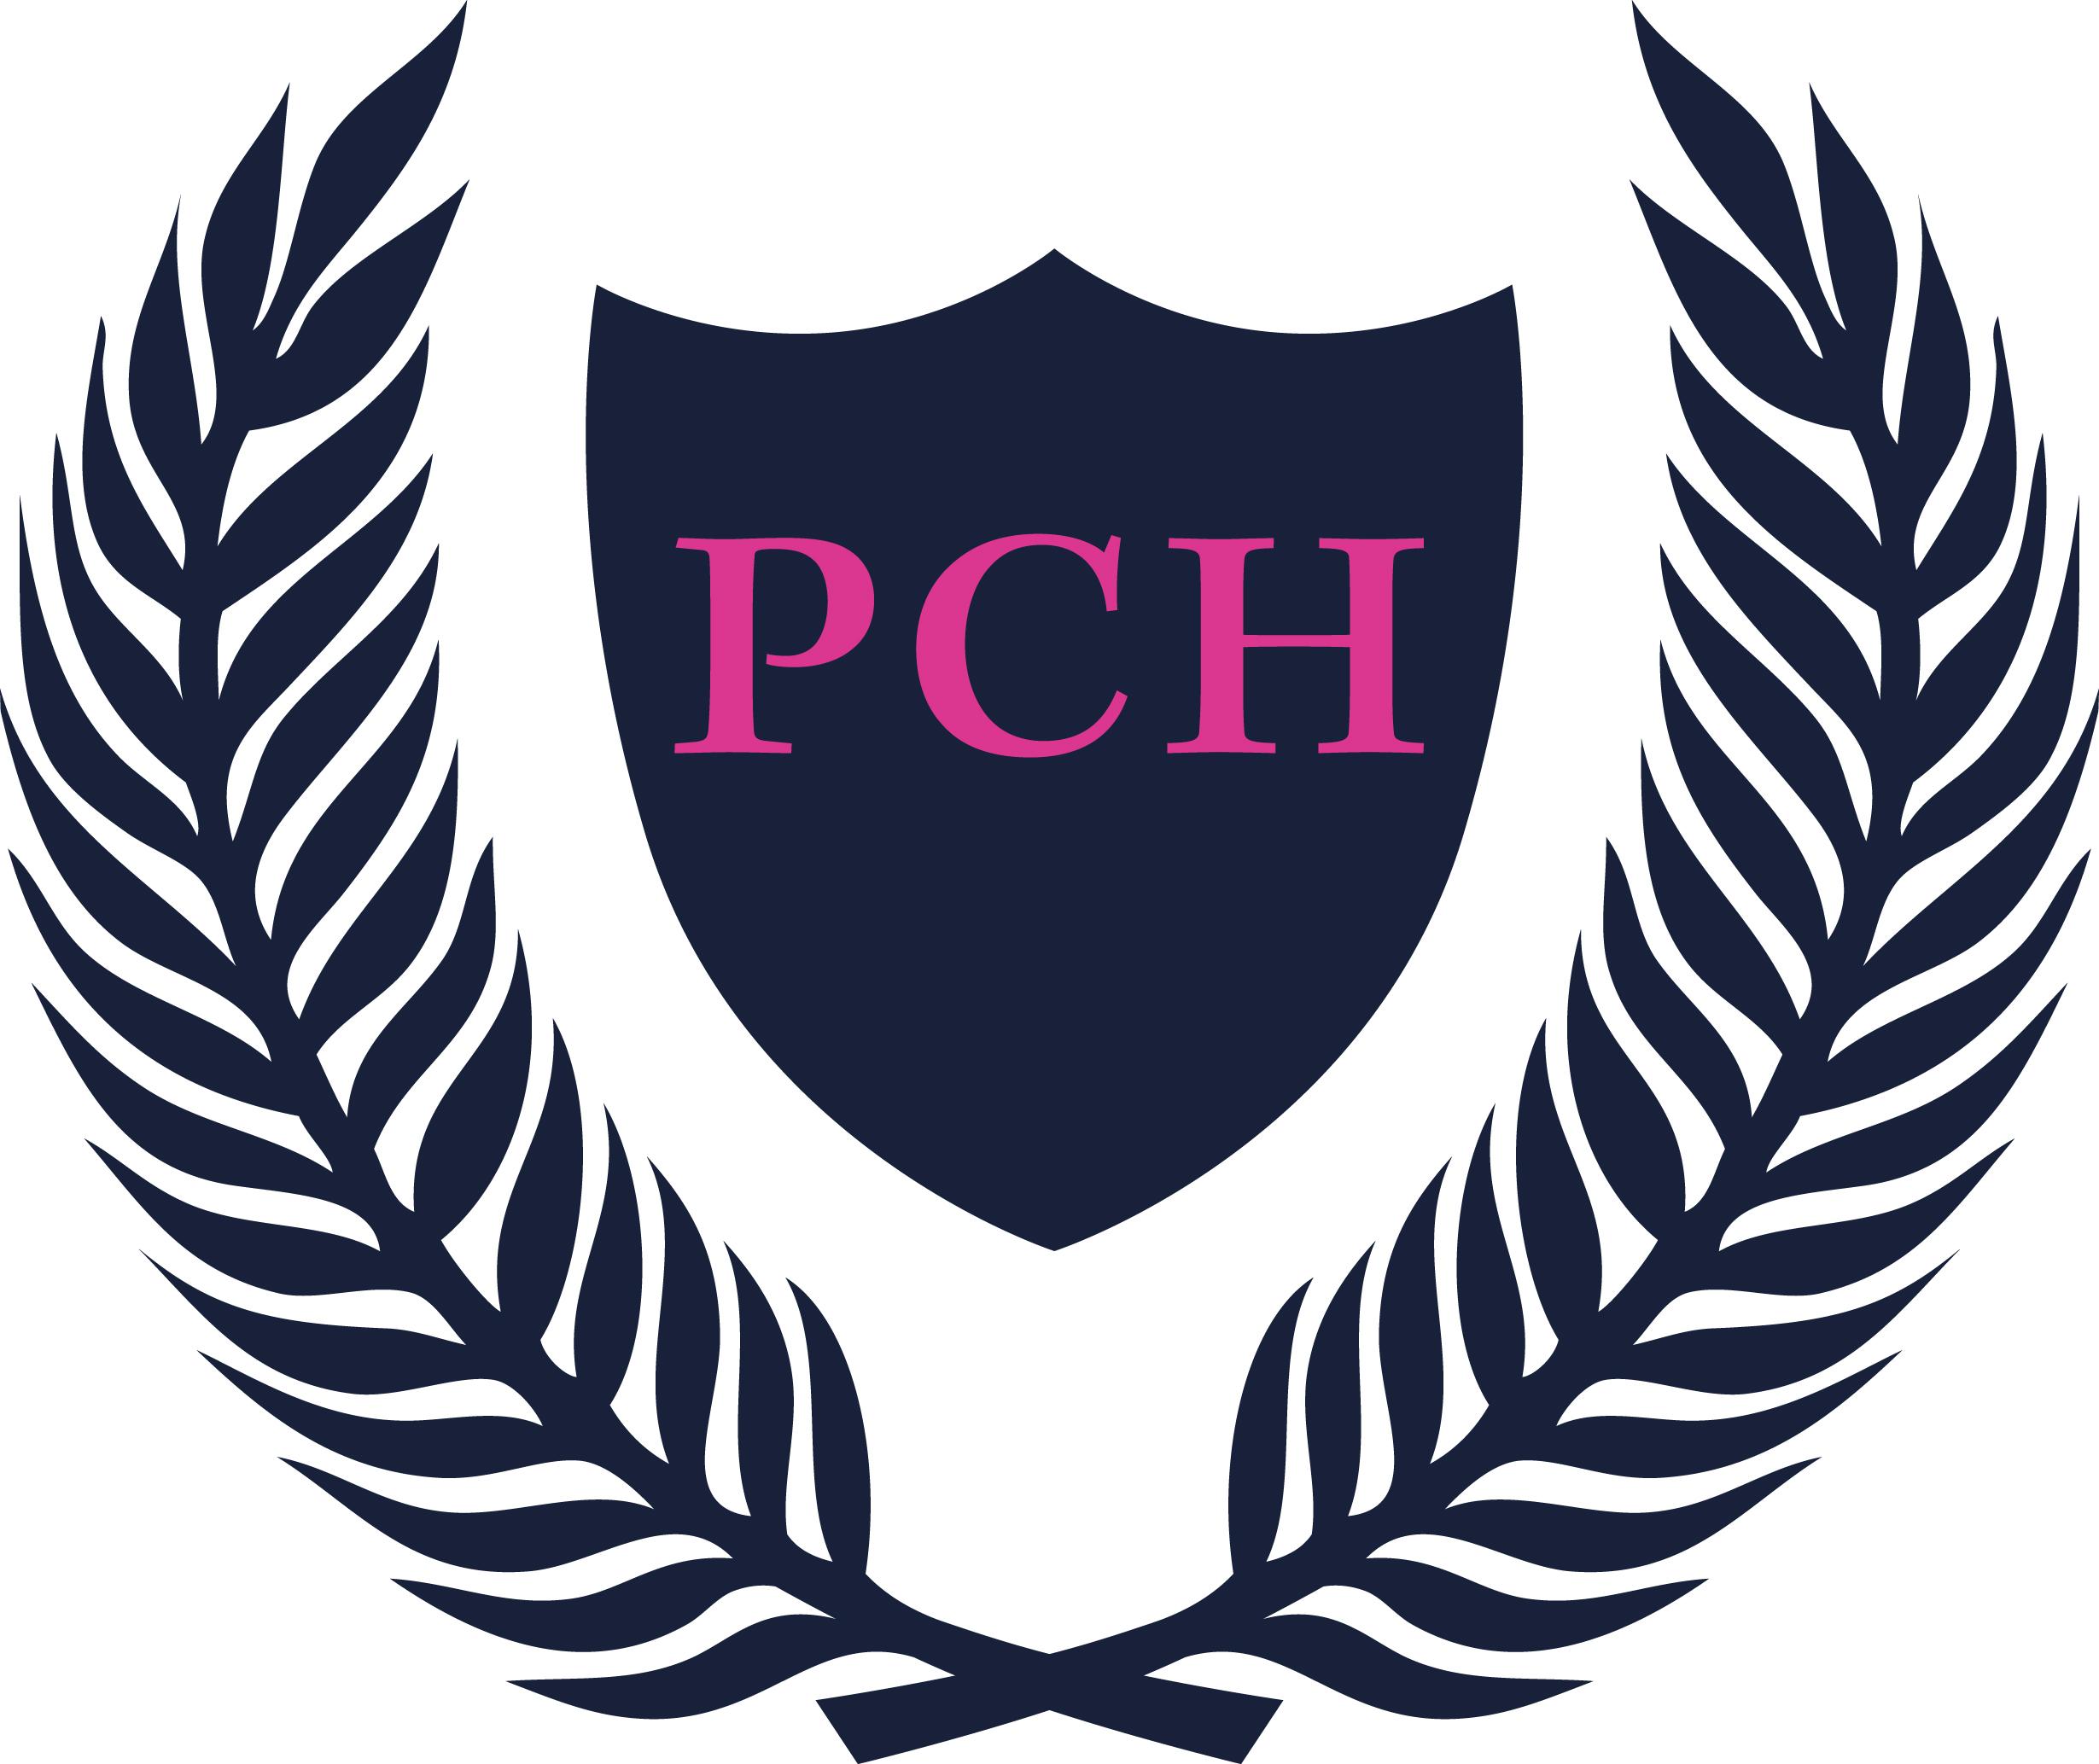 portcityhigh-logo.jpg